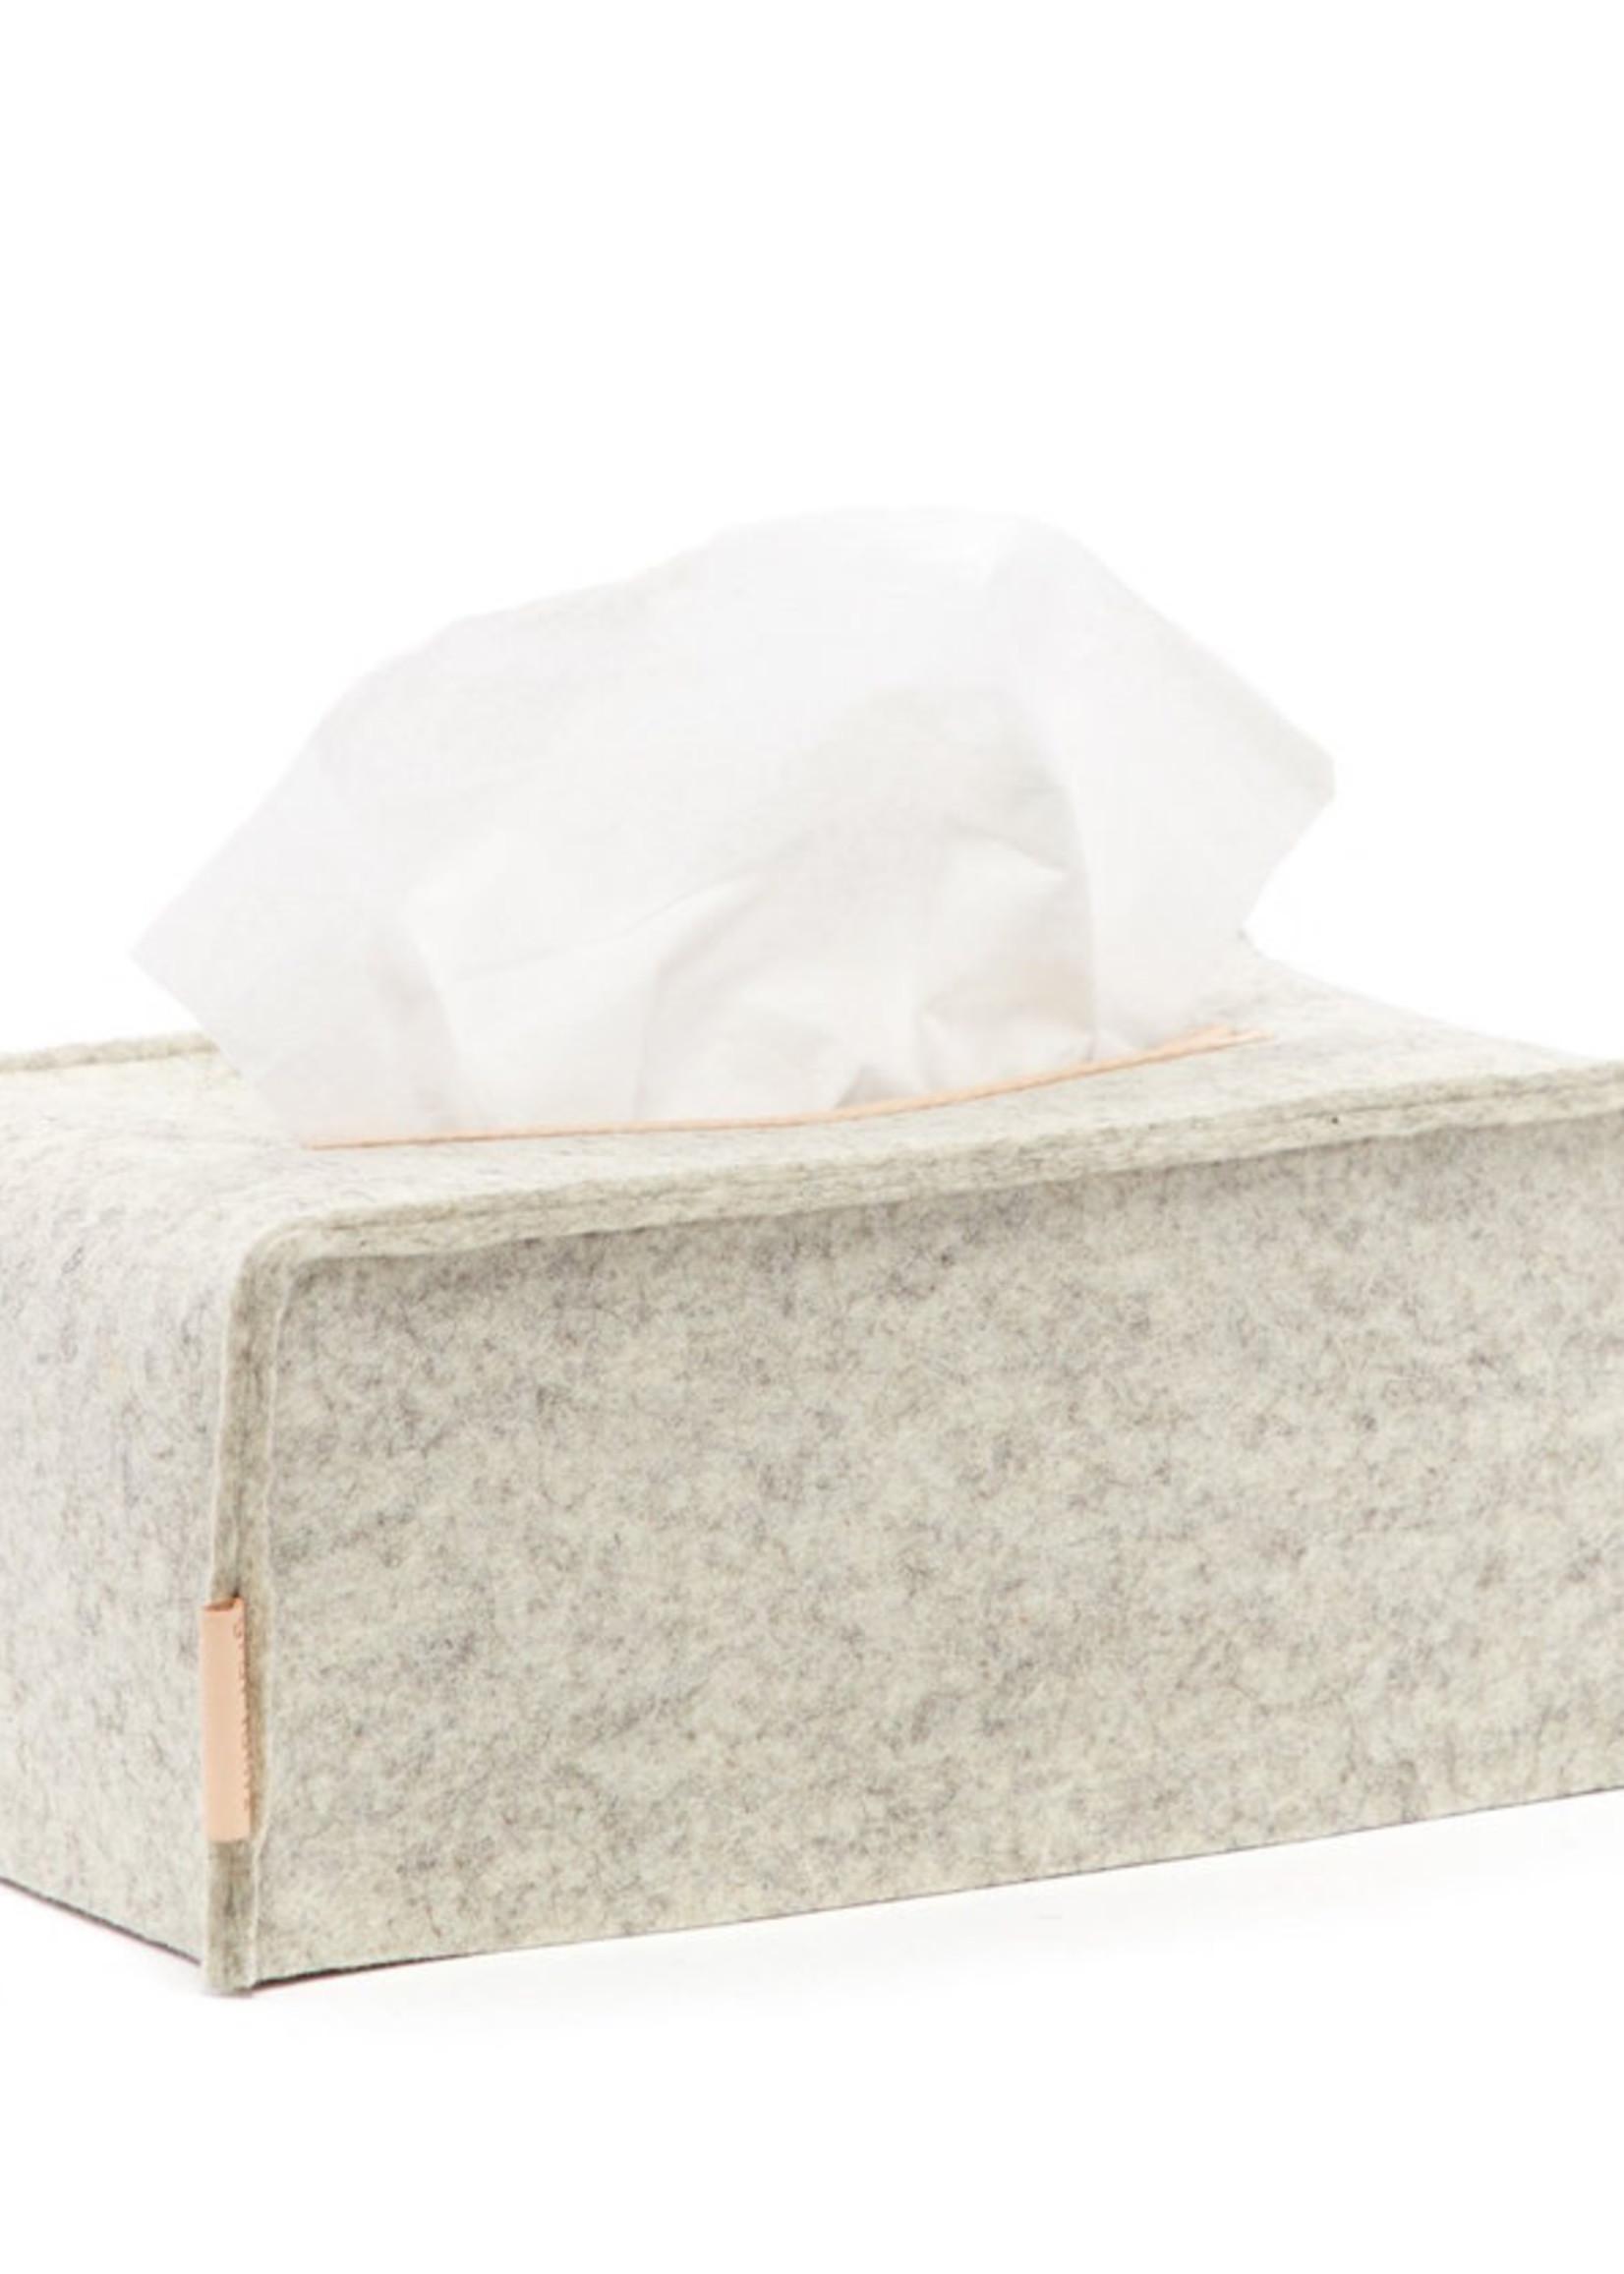 Graf Lantz Graf Lantz Tissue Box Cover Large Heather White Felt